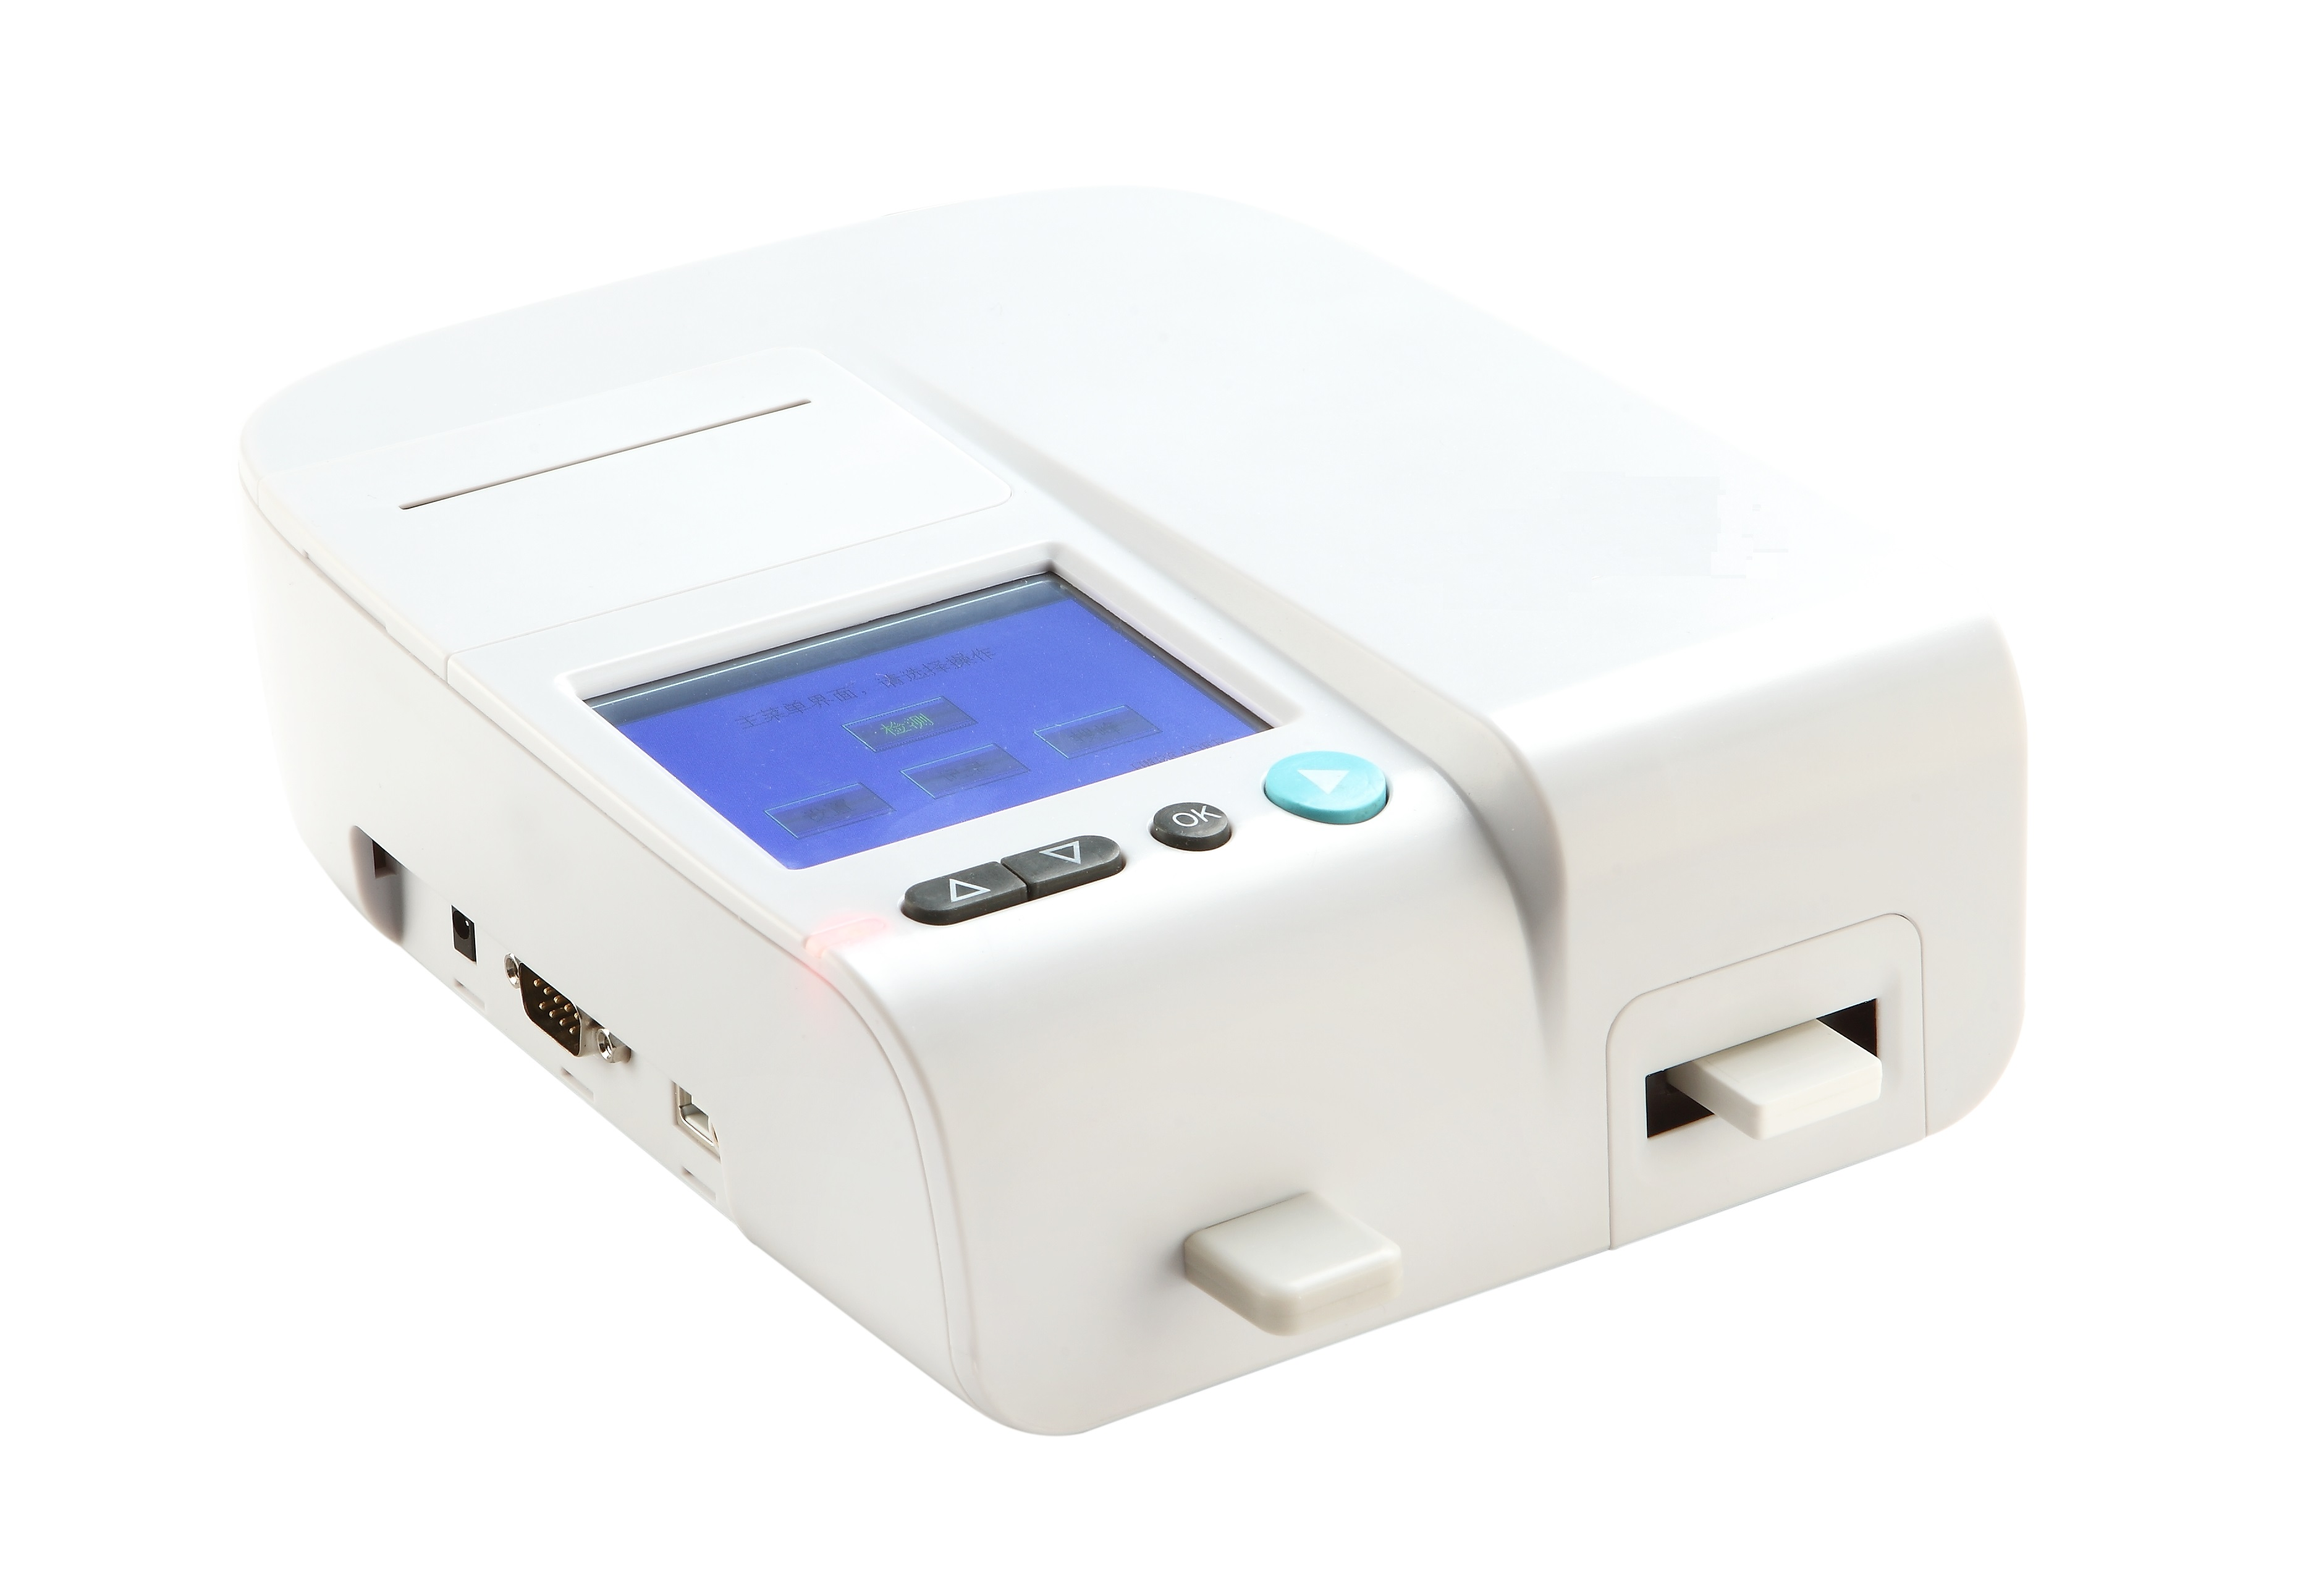 Picture of Dry Fluorescence Immunoassay Analyzer (FIC-S100)